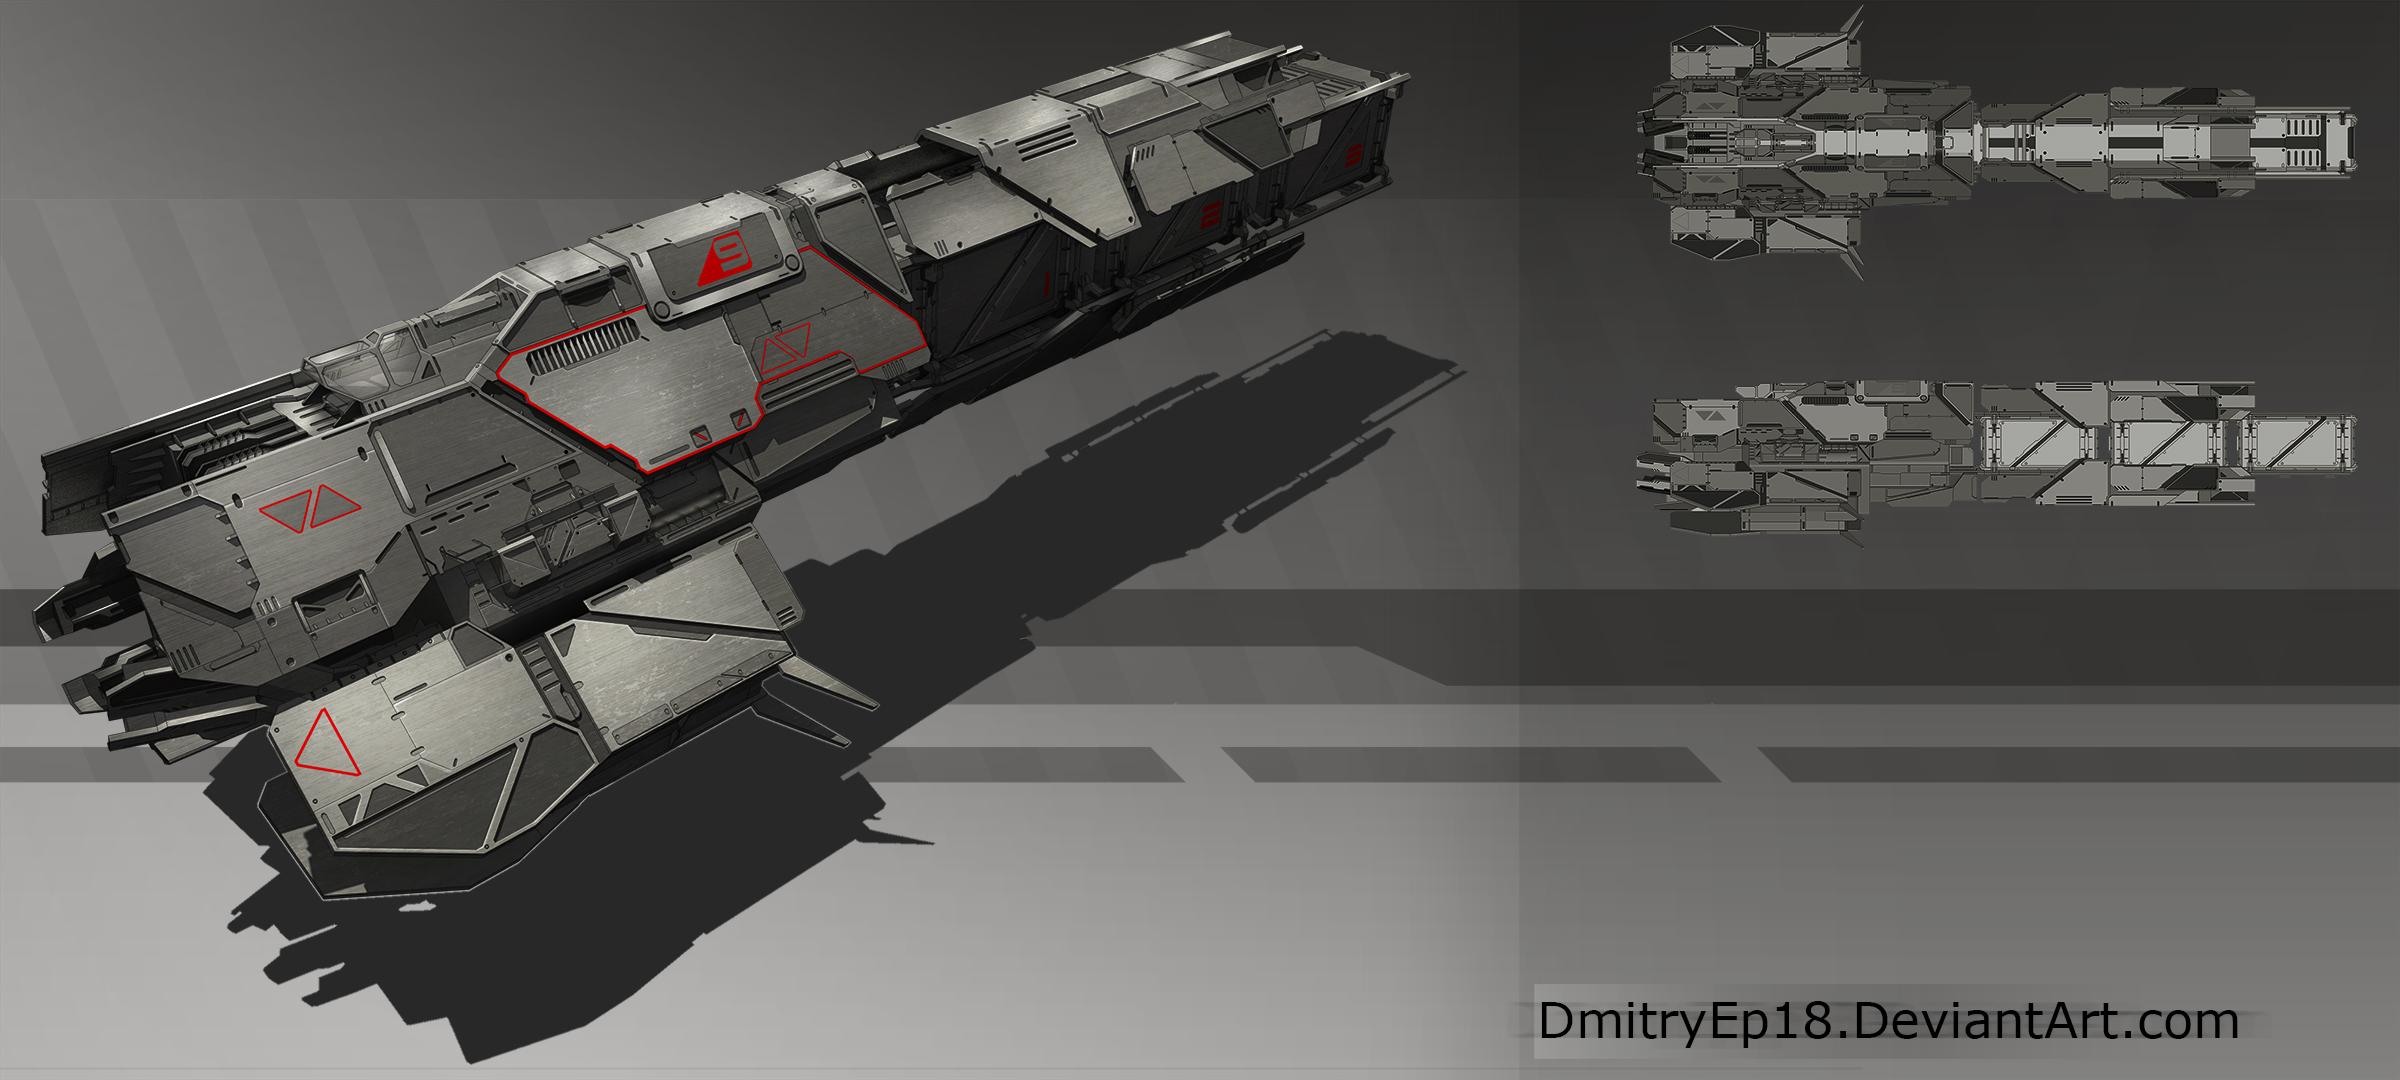 Transport concept by DmitryEp18